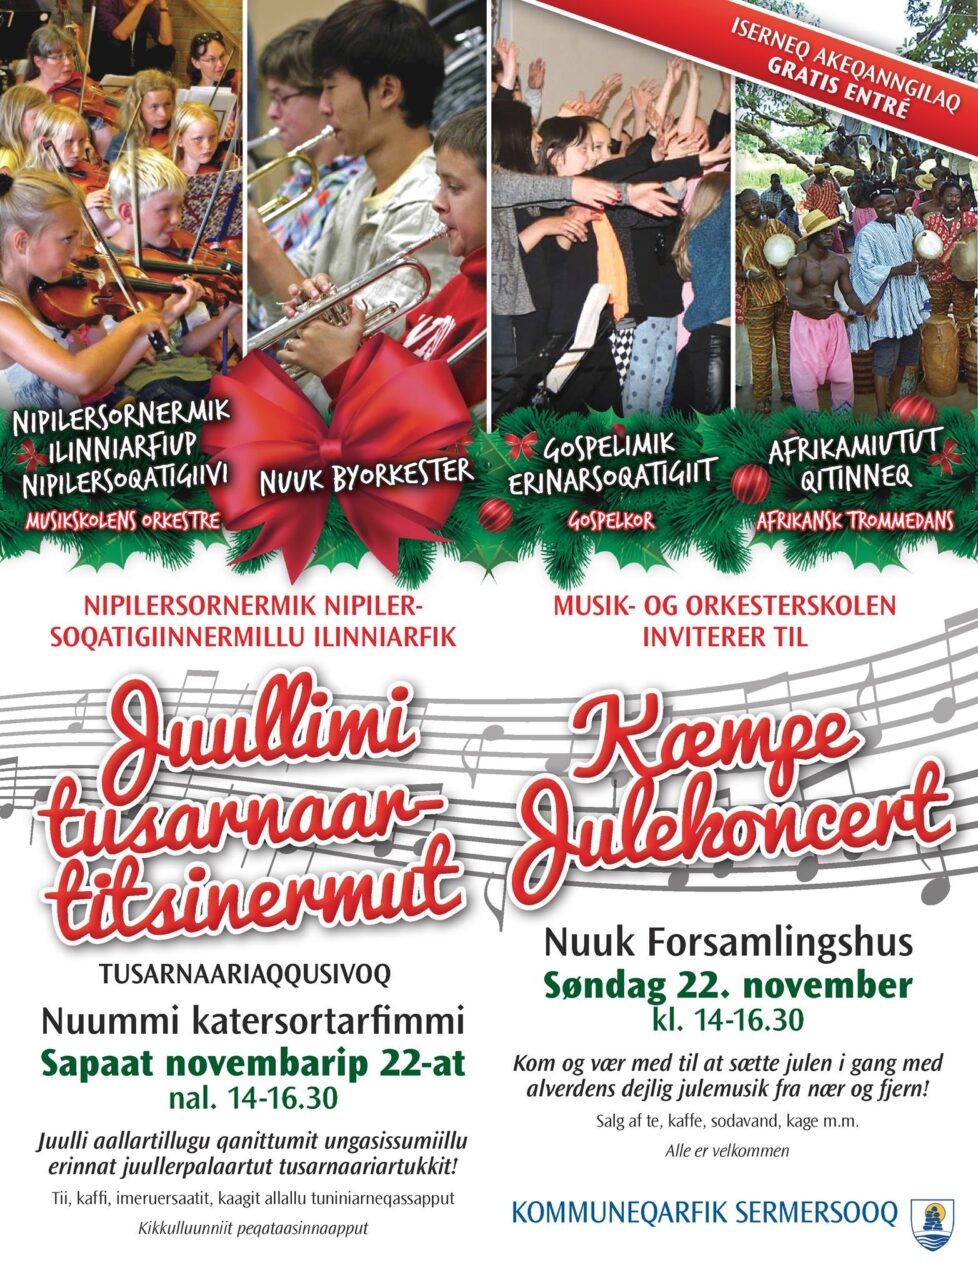 Sermersooq Musikskole annonce